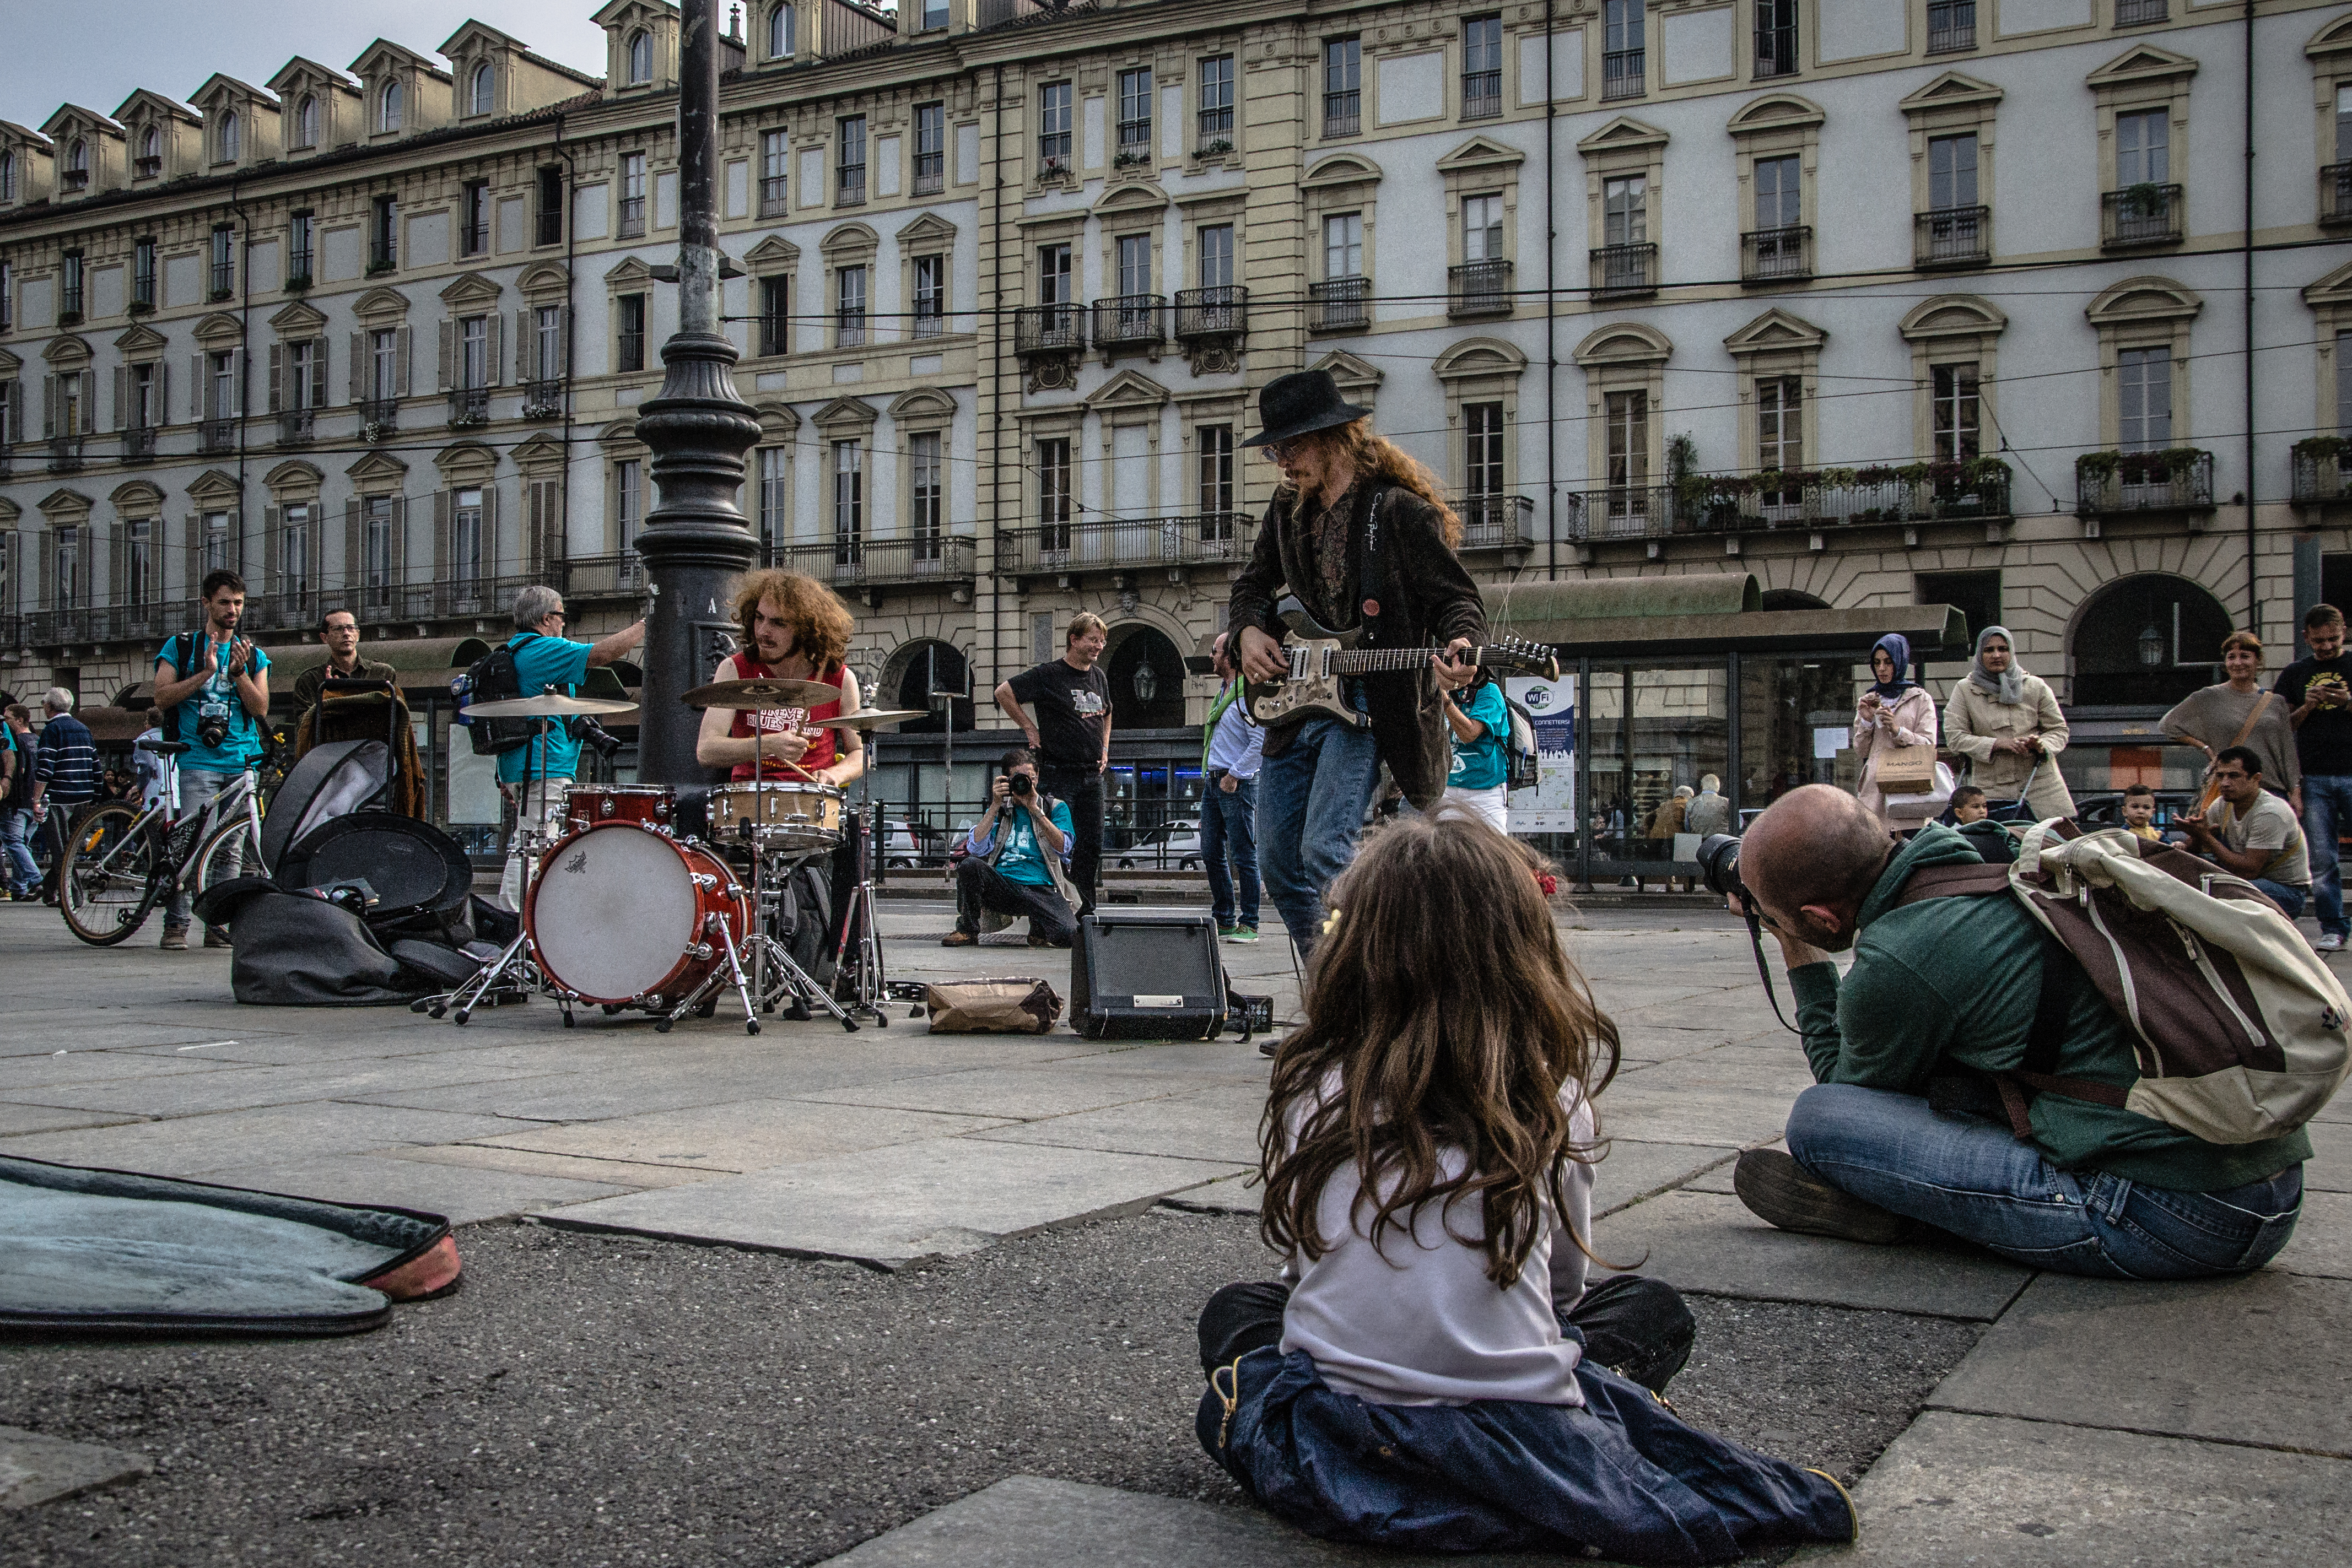 Torino Photo Marathon 2014 - The World's Paths